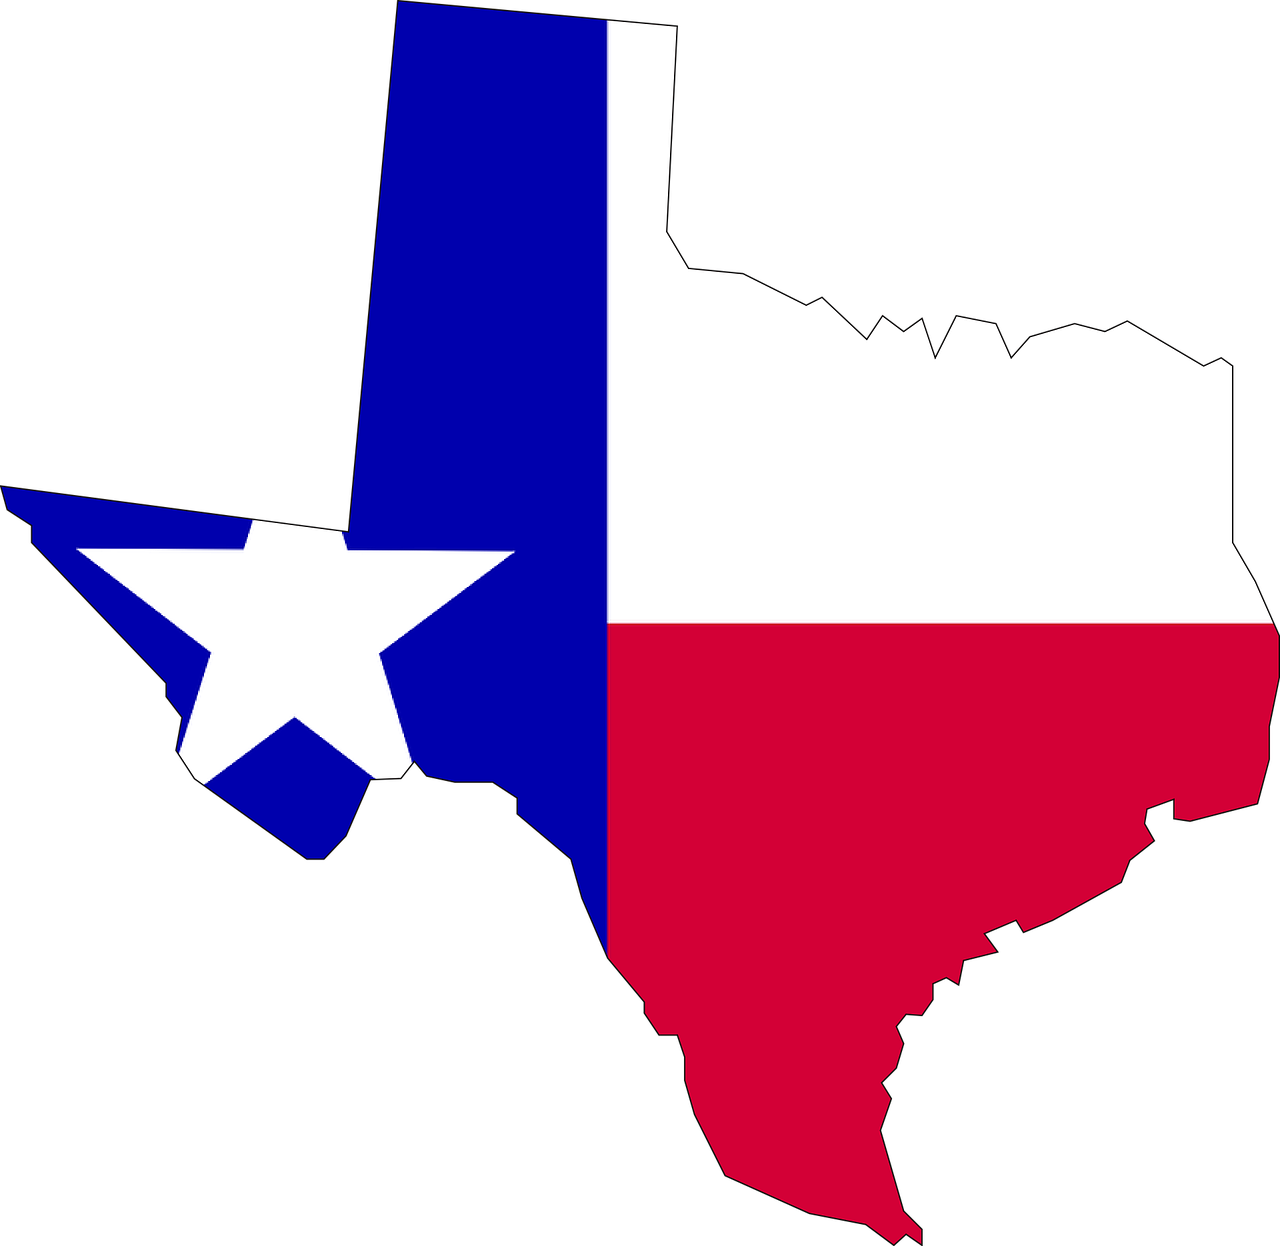 piwc-wines-kisses-texas.jpg